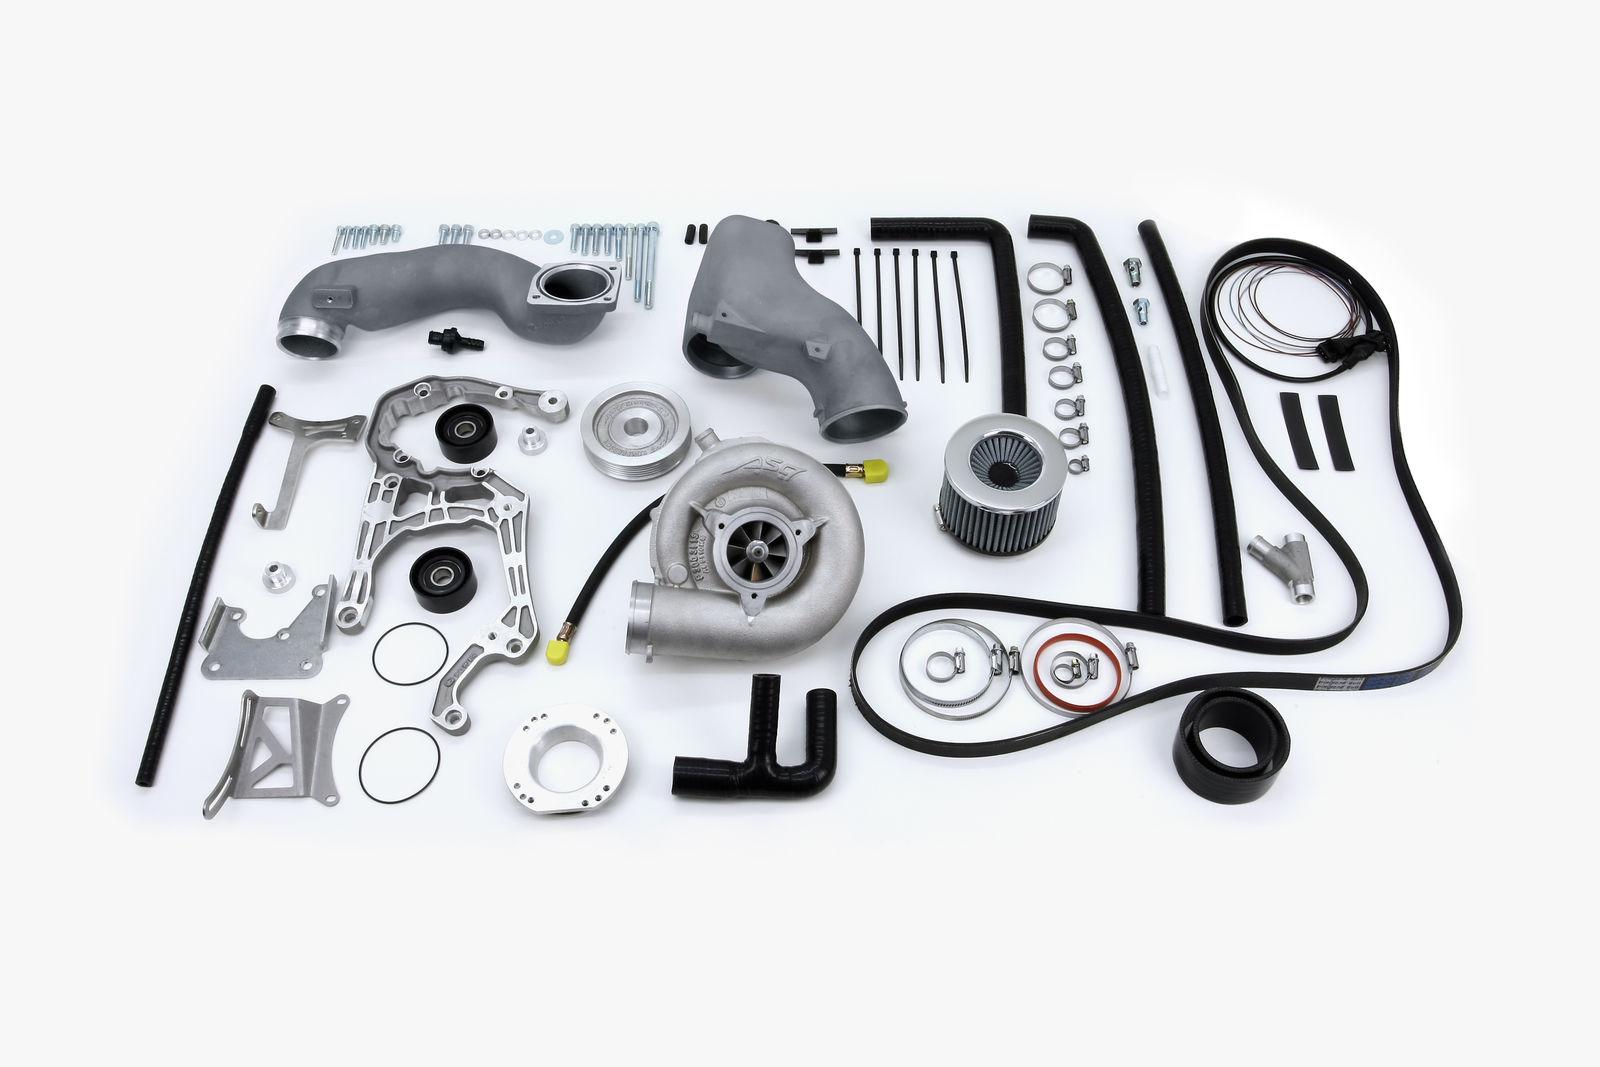 E46 BMW 330i & E85 Z4 with Power Kit by G-Power (7)